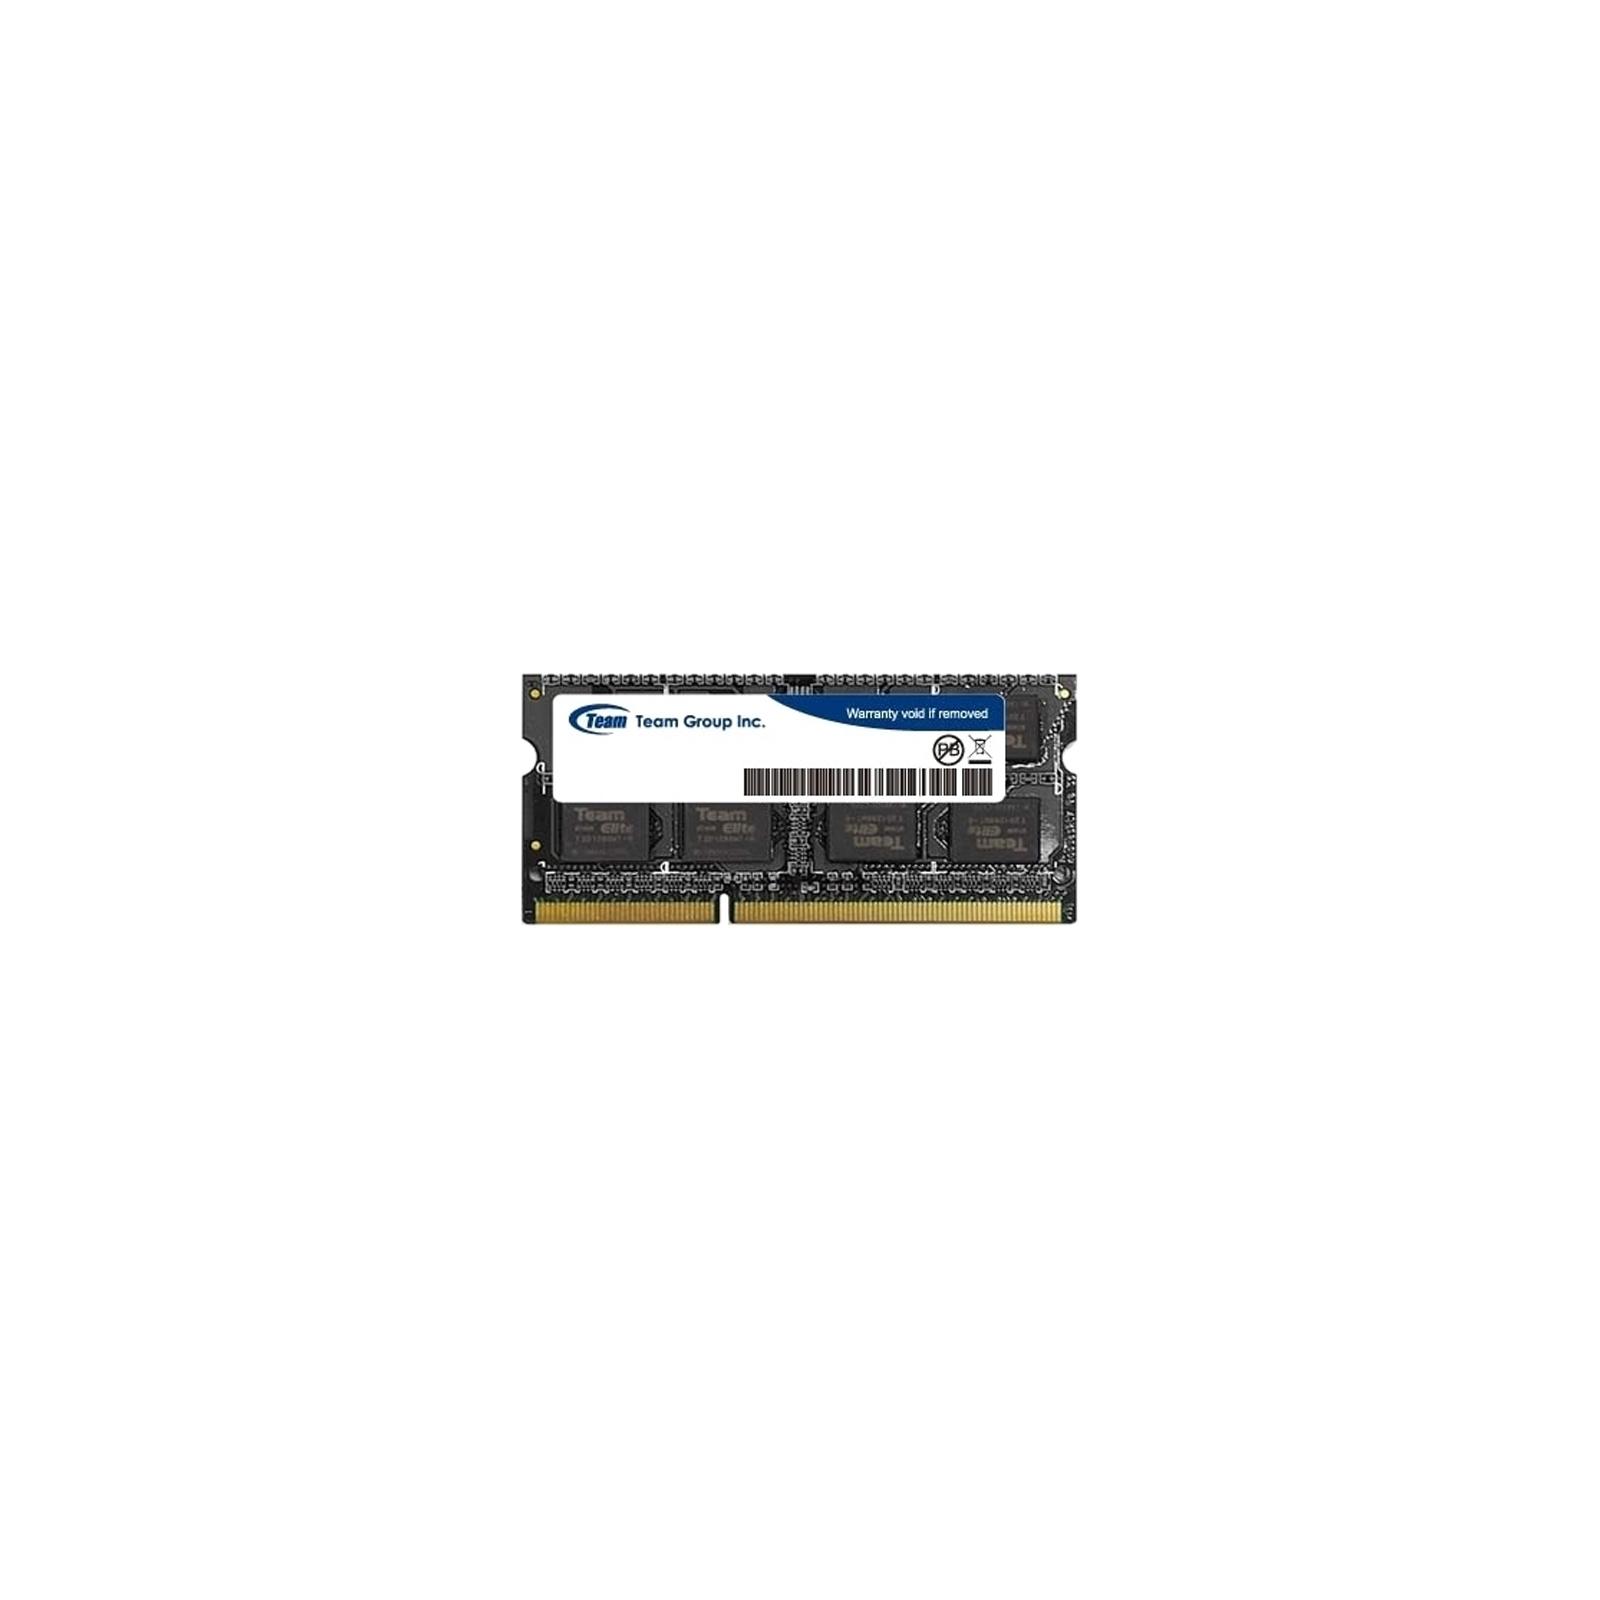 Модуль памяти для ноутбука SoDIMM DDR3 8GB 1600 MHz Team (TED3L8GM1600C11-SBK)